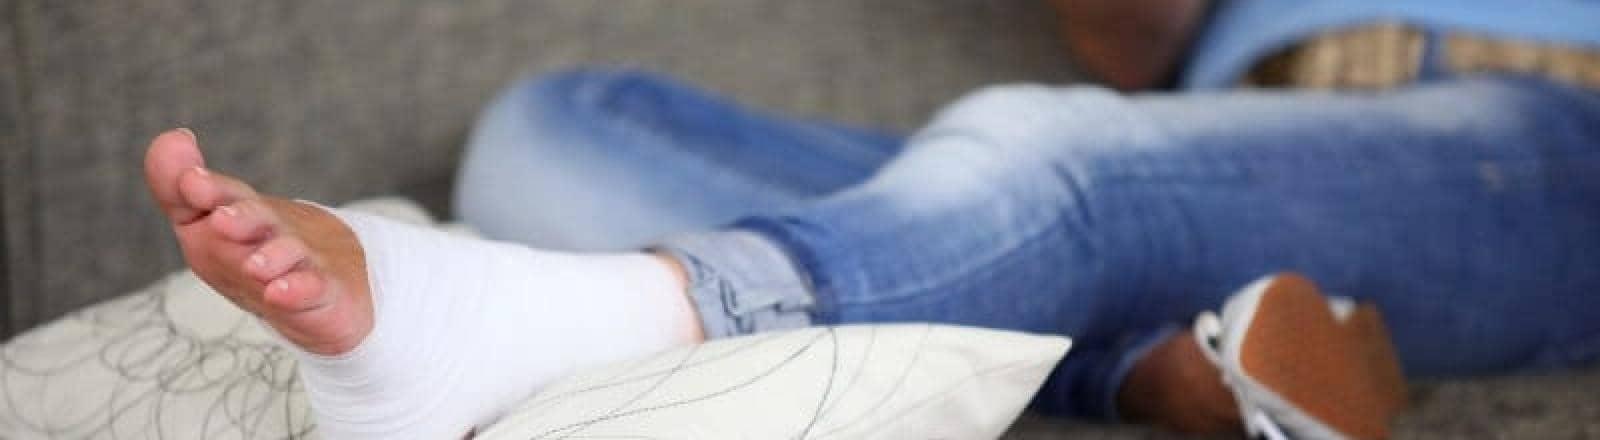 esguince o torcedura de tobillo